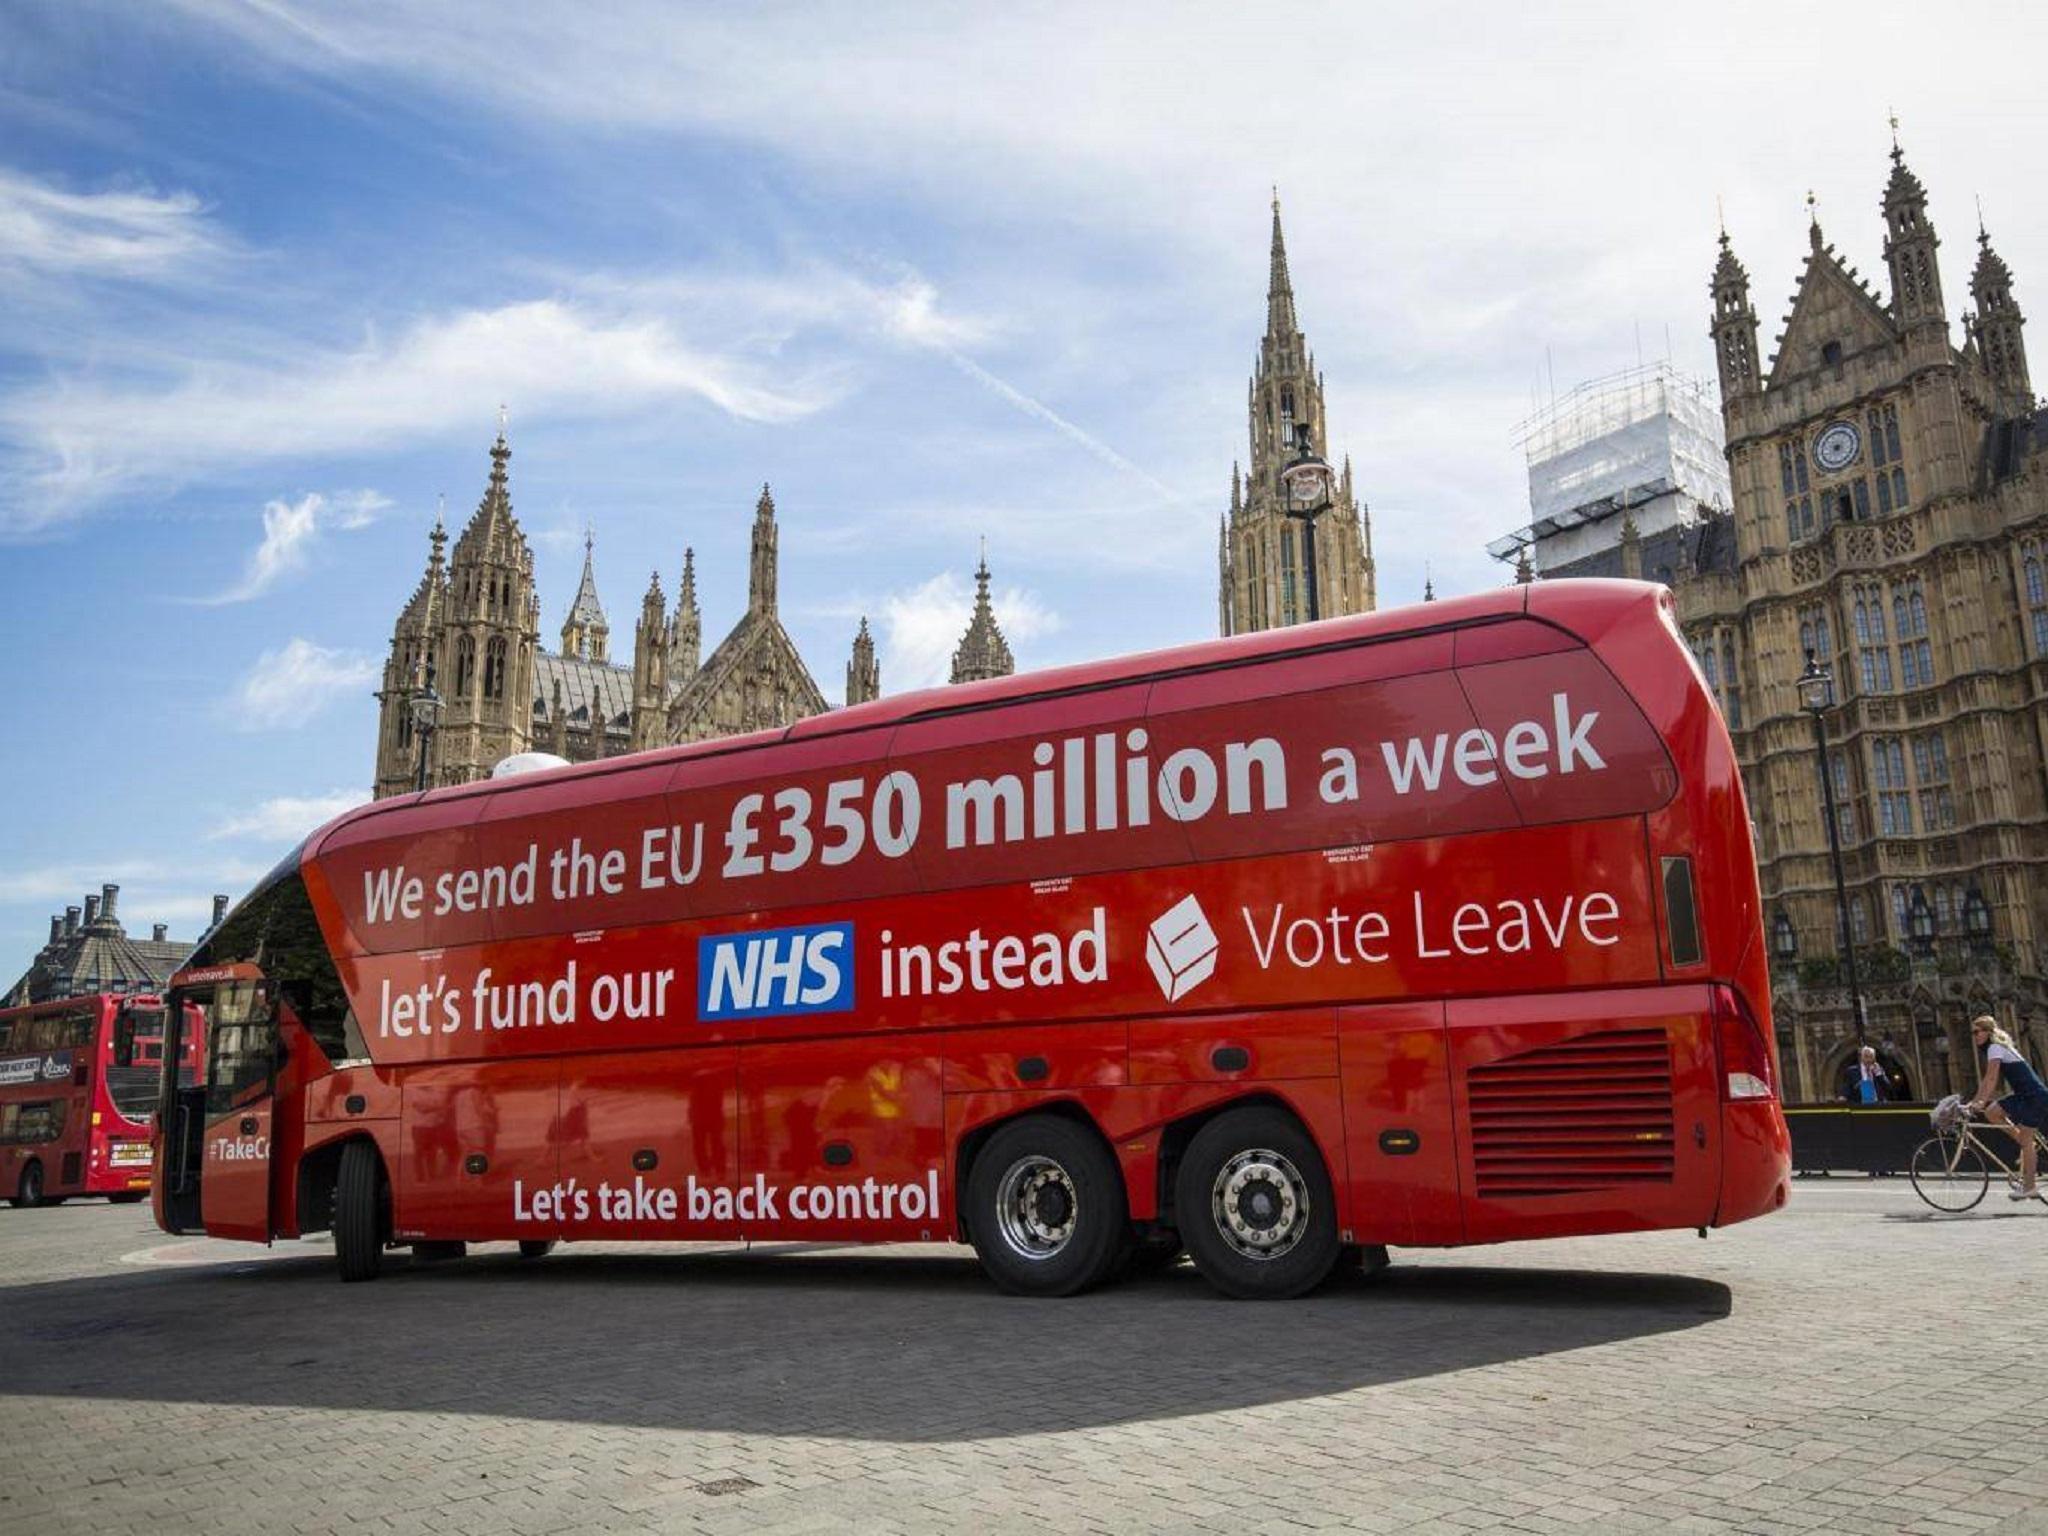 Boris Johnson: Court quashes attempt to prosecute prime minister over Brexit bus 'lies'